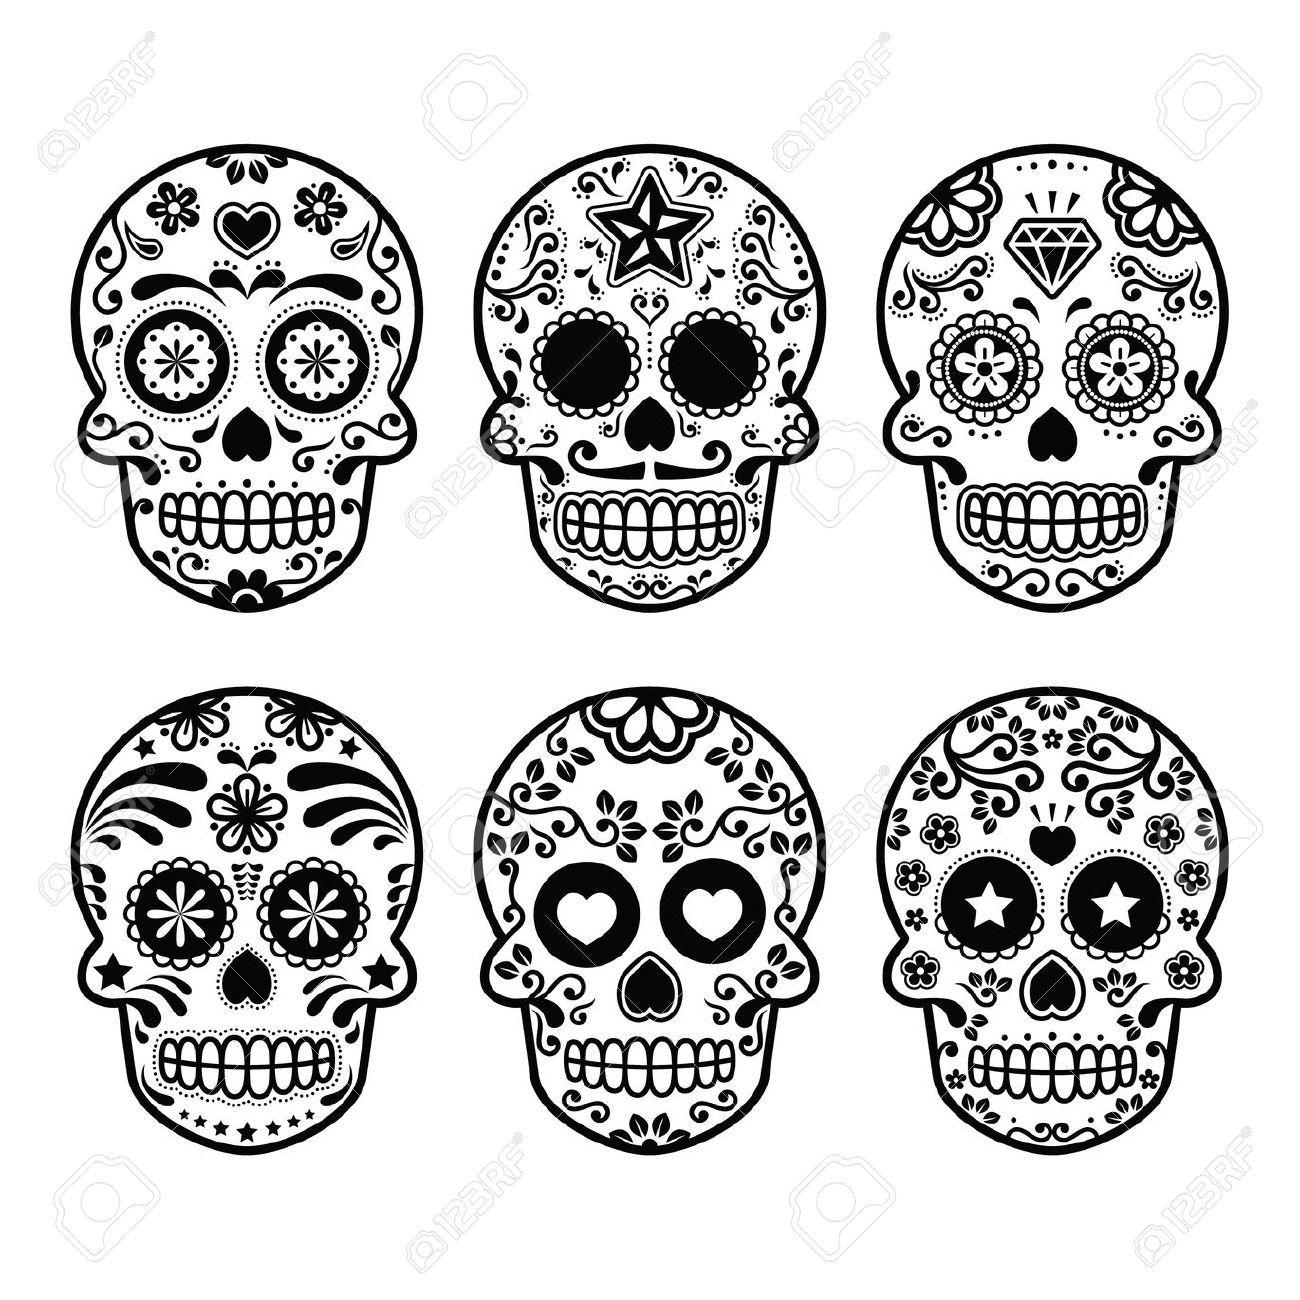 Pin de Jen Chappell en voodoo | Pinterest